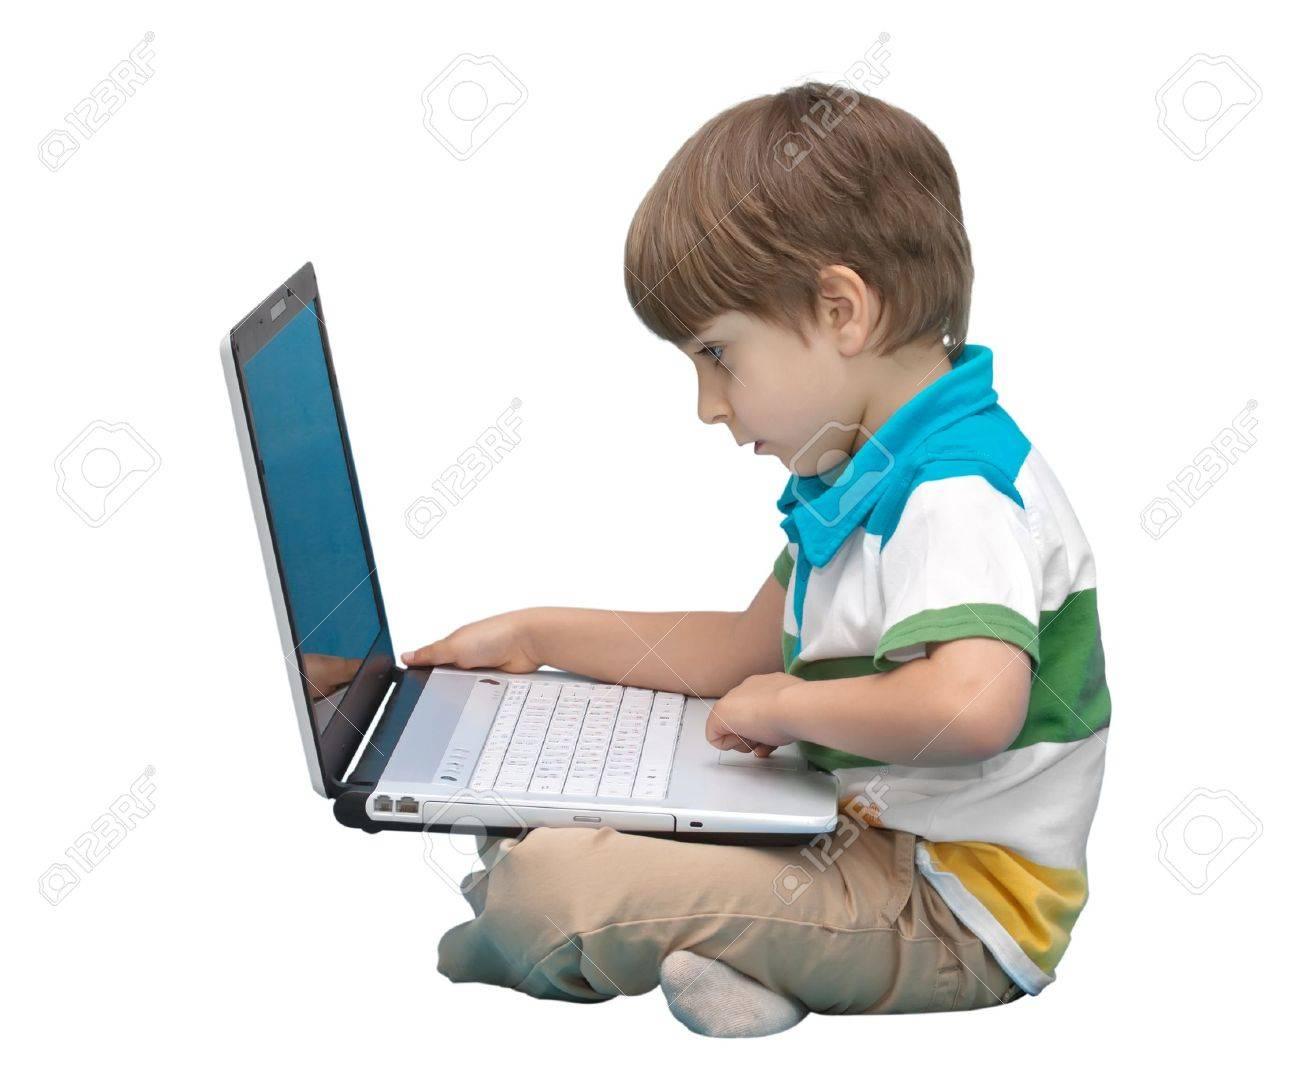 Boy with laptop isolated on white background Stock Photo - 9334207